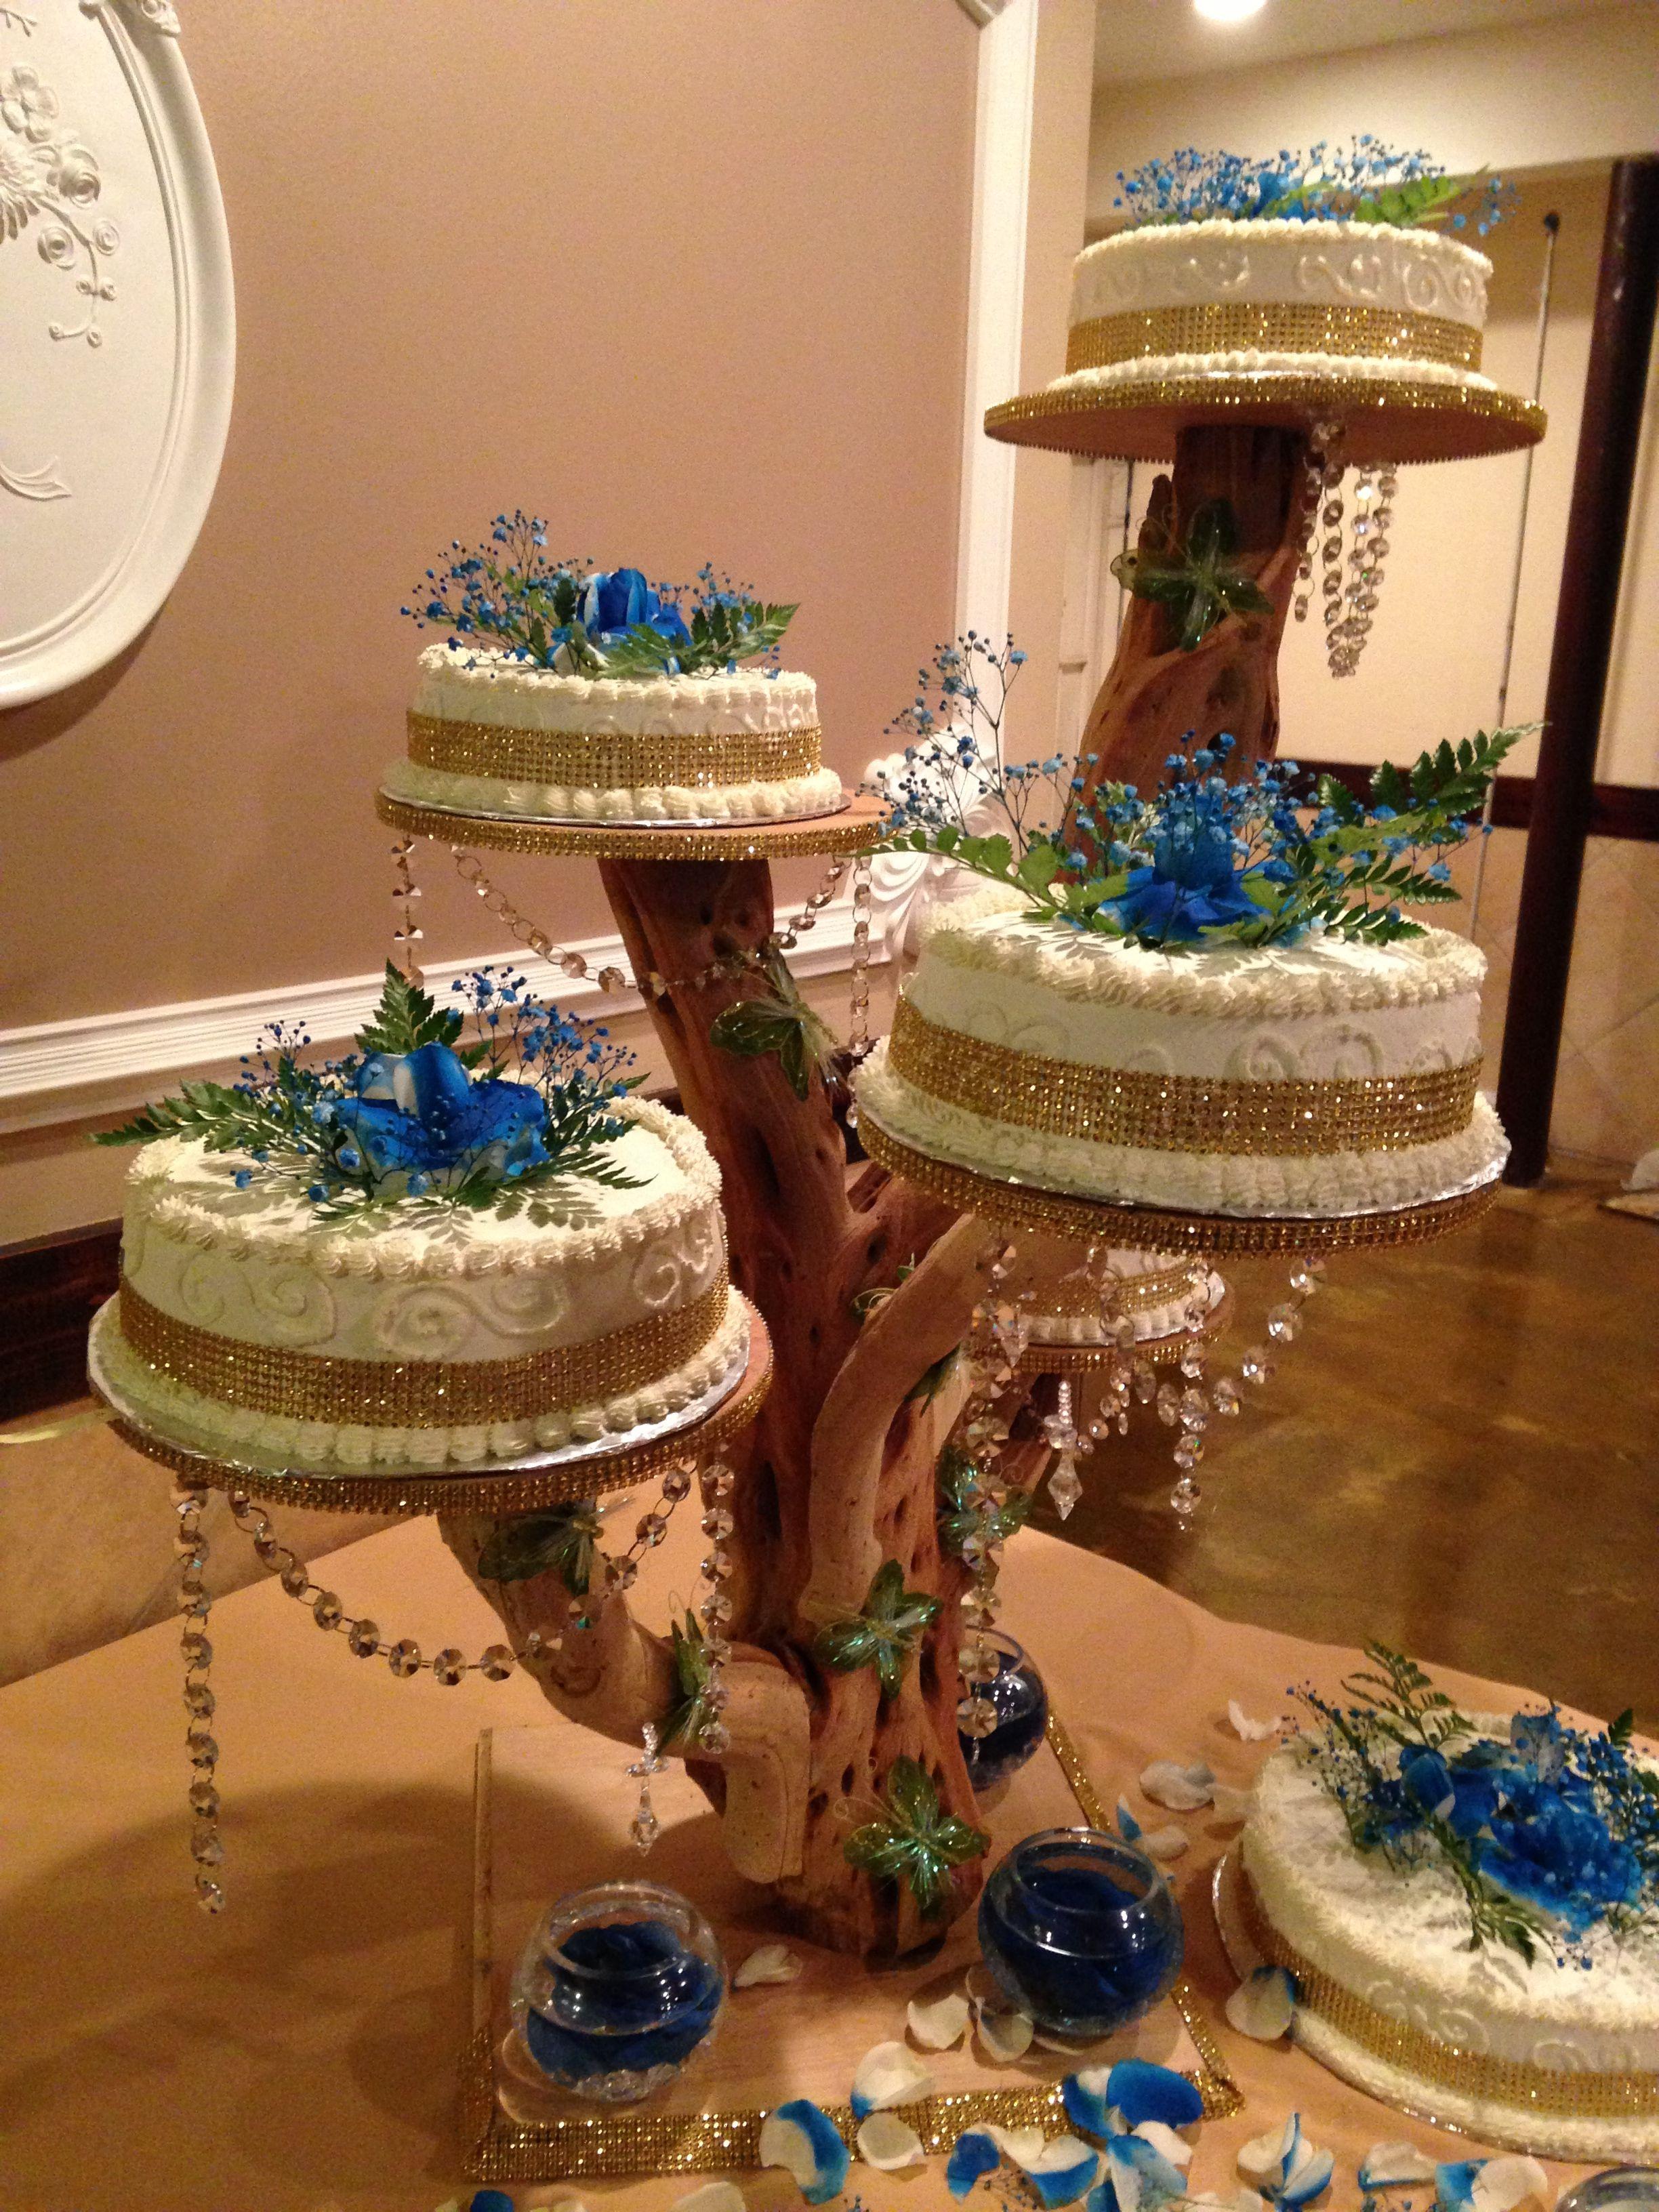 Tree branch cake standwedding cake ideaquinceañera cakemade it